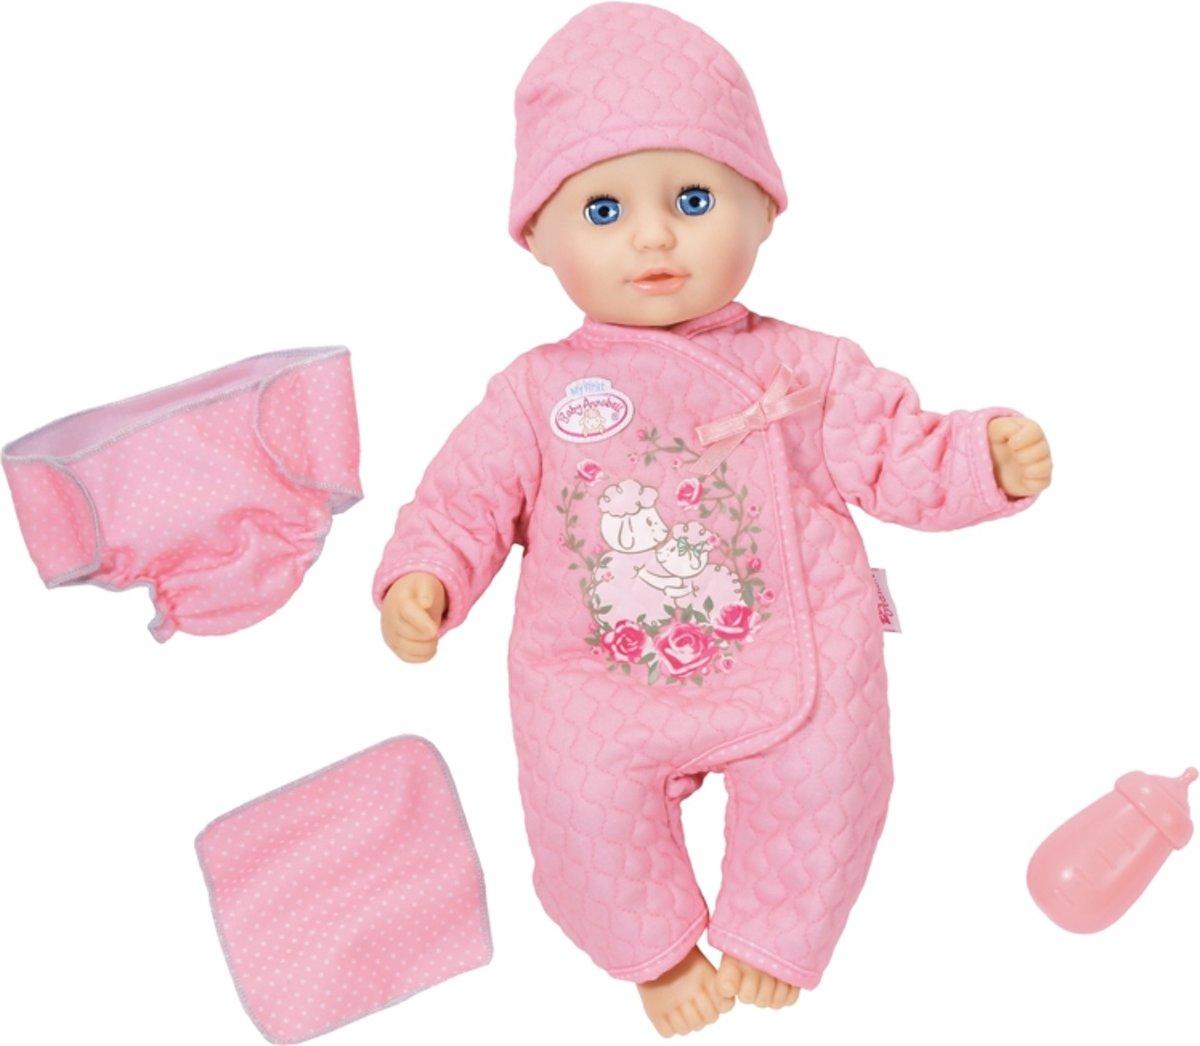 Baby Annabell Little Baby Fun 36cm